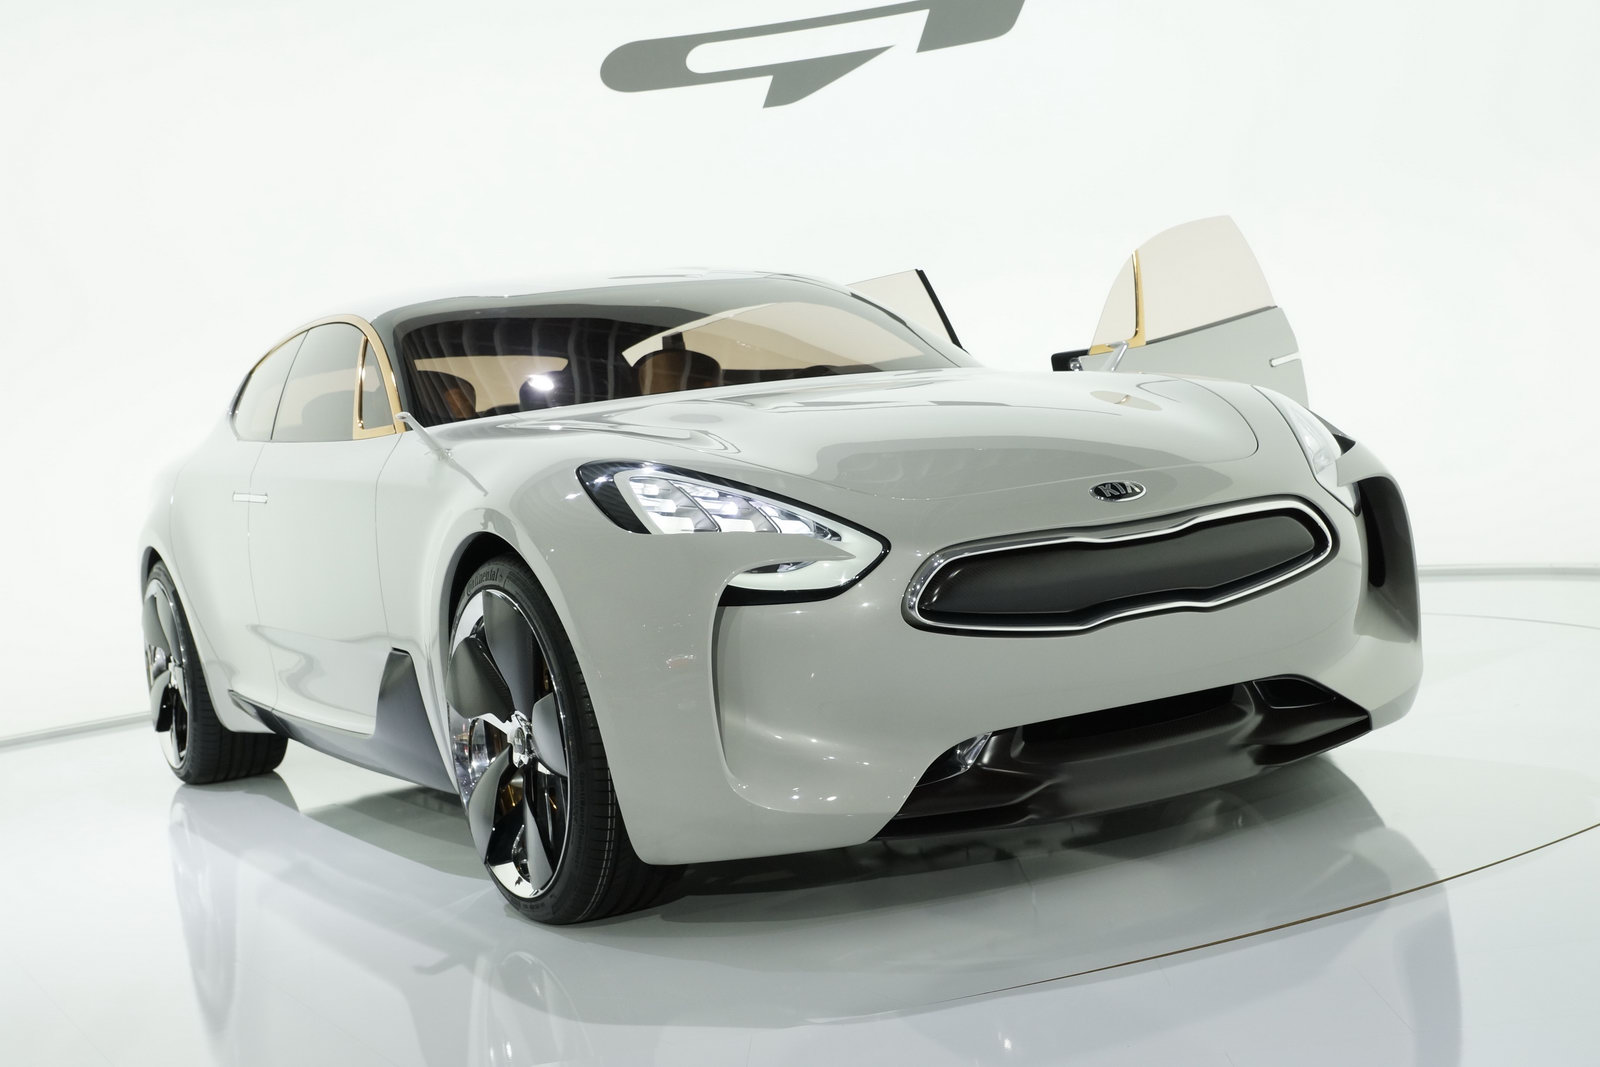 KIA GT Concept tại triển lãm xe hơi Frankfurt 2011